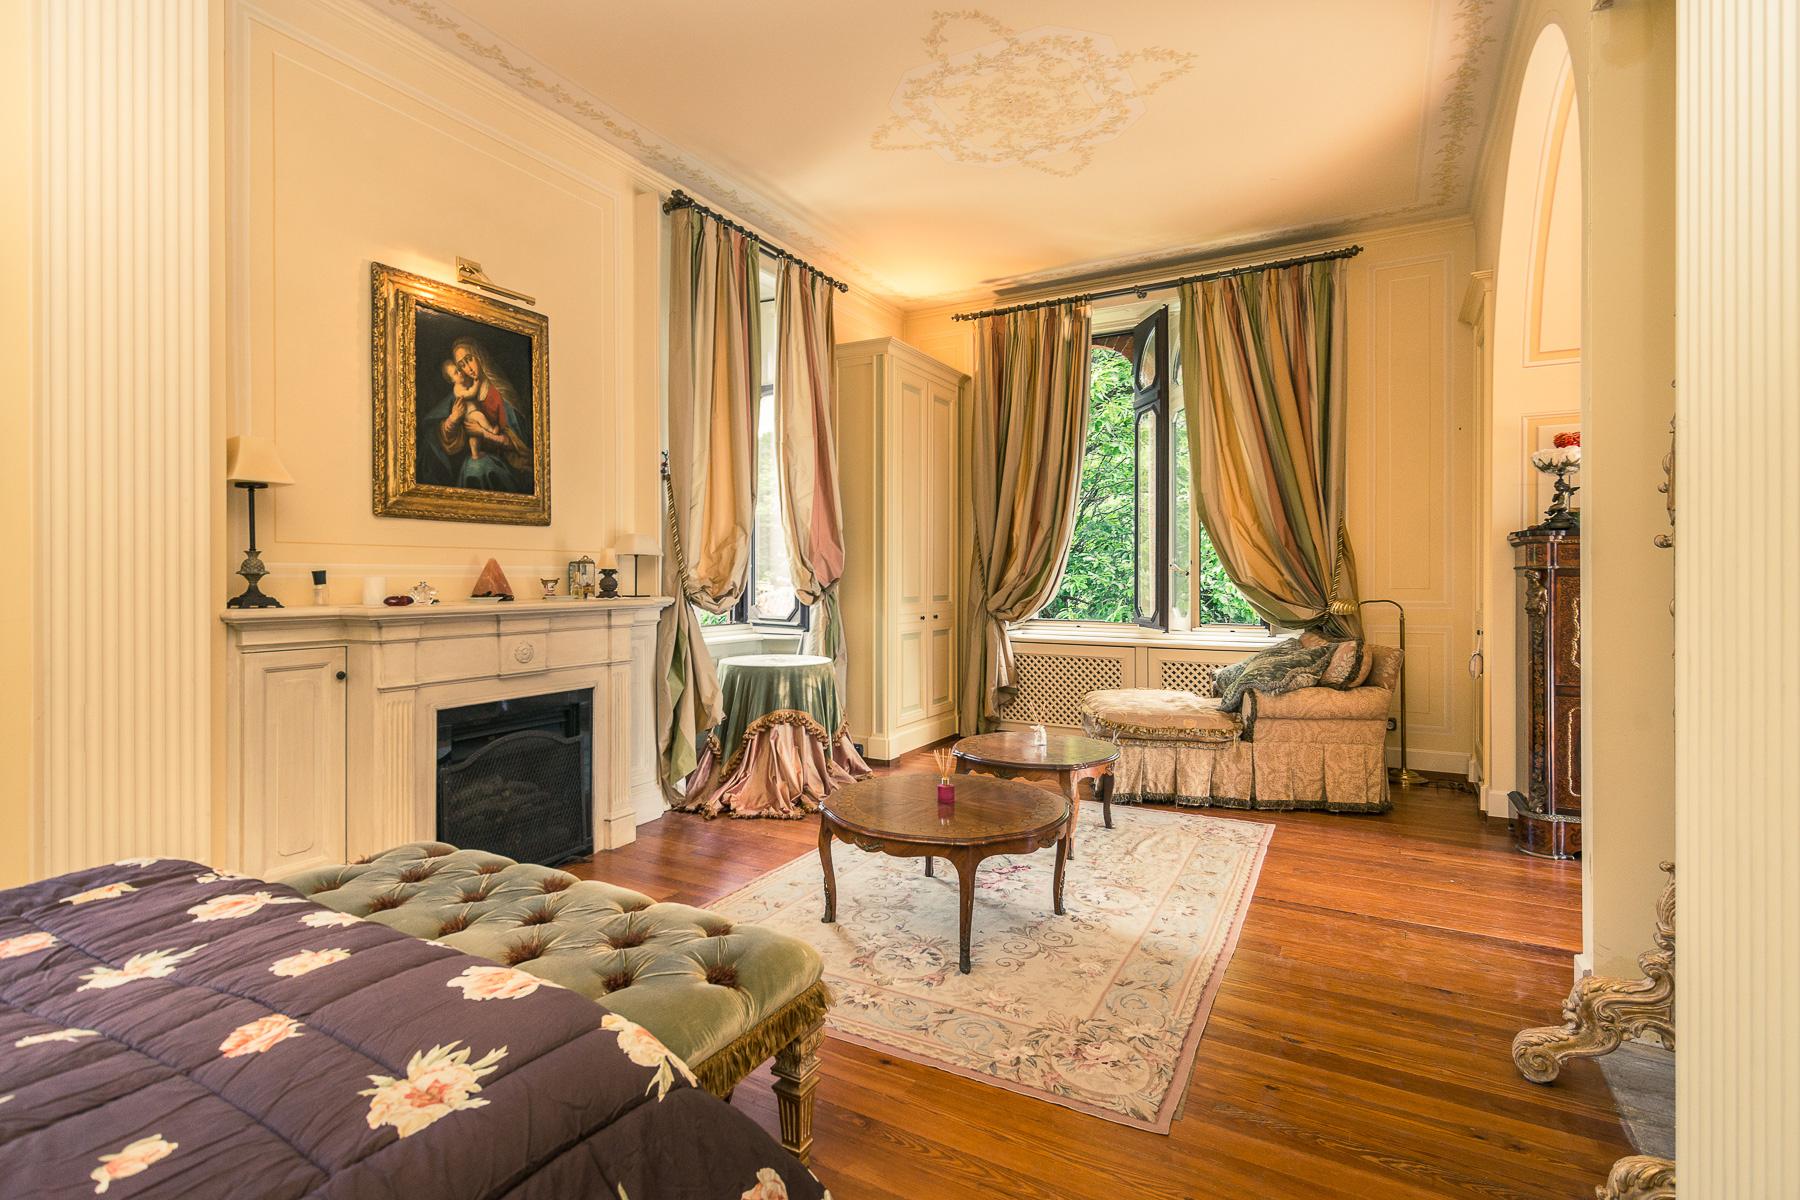 Villa in Vendita a Varese: 5 locali, 1150 mq - Foto 16